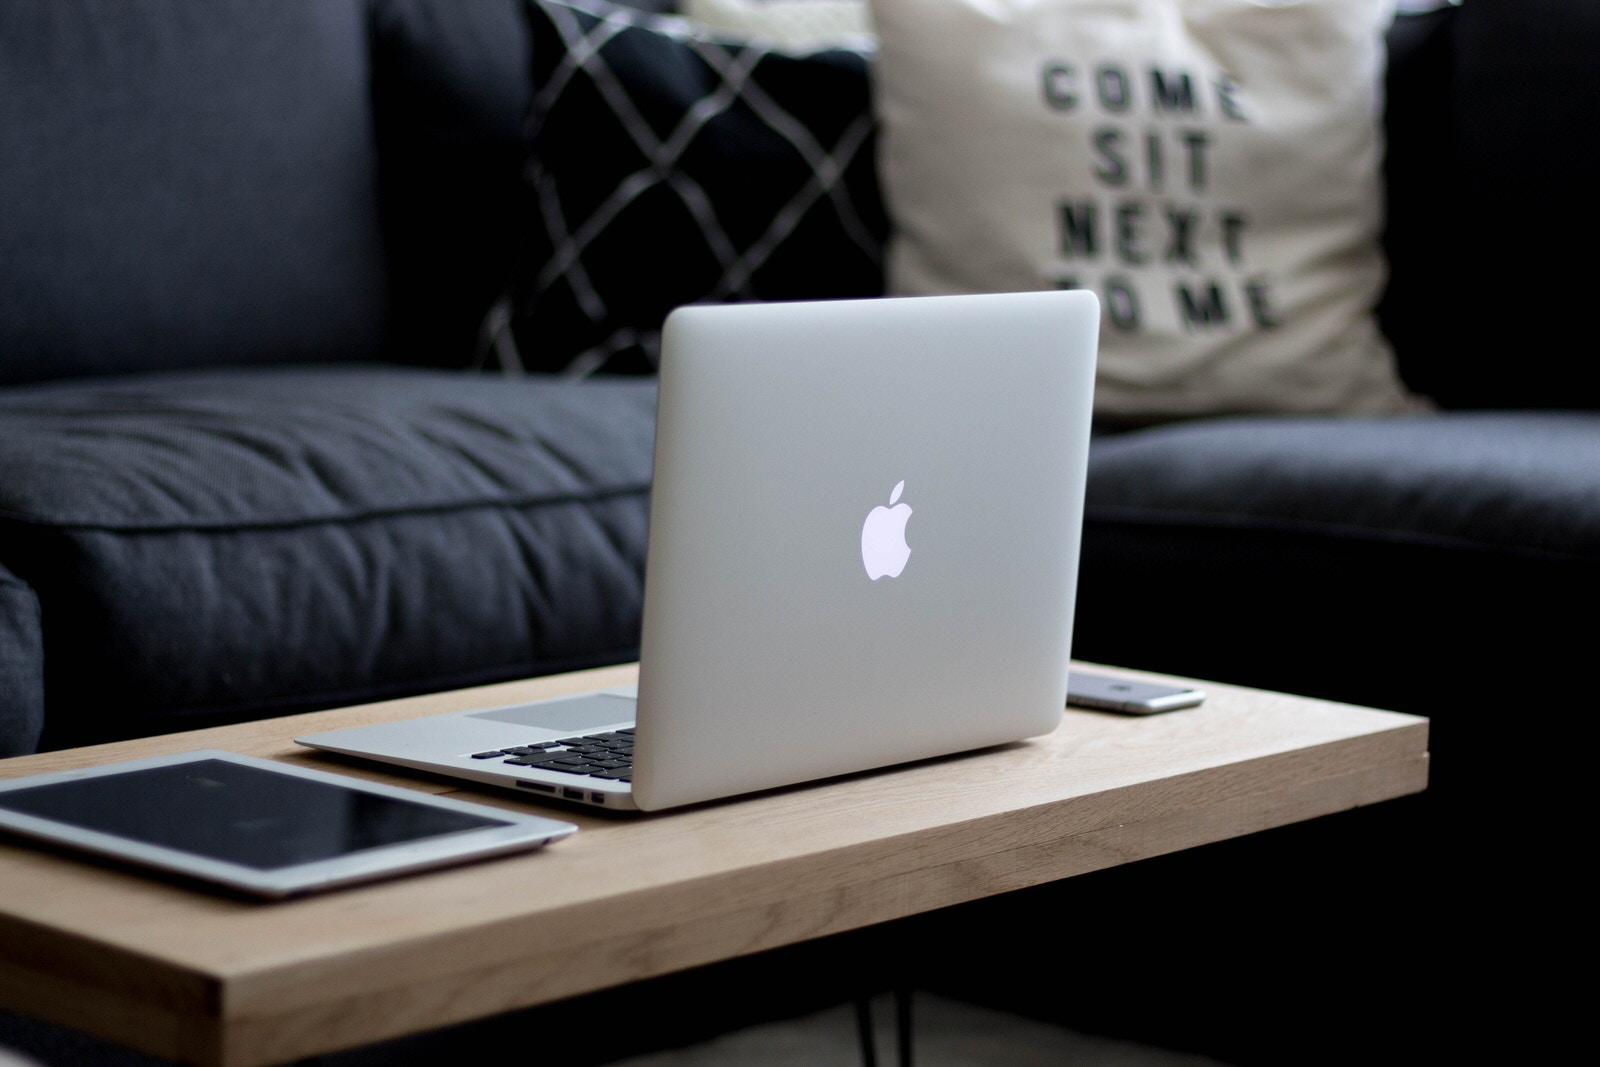 Home_Networks_Mac_Book_Air_Silver_iPad_iPhone_on_Brown_Coffee_Table_Dark_Blue_Sofa